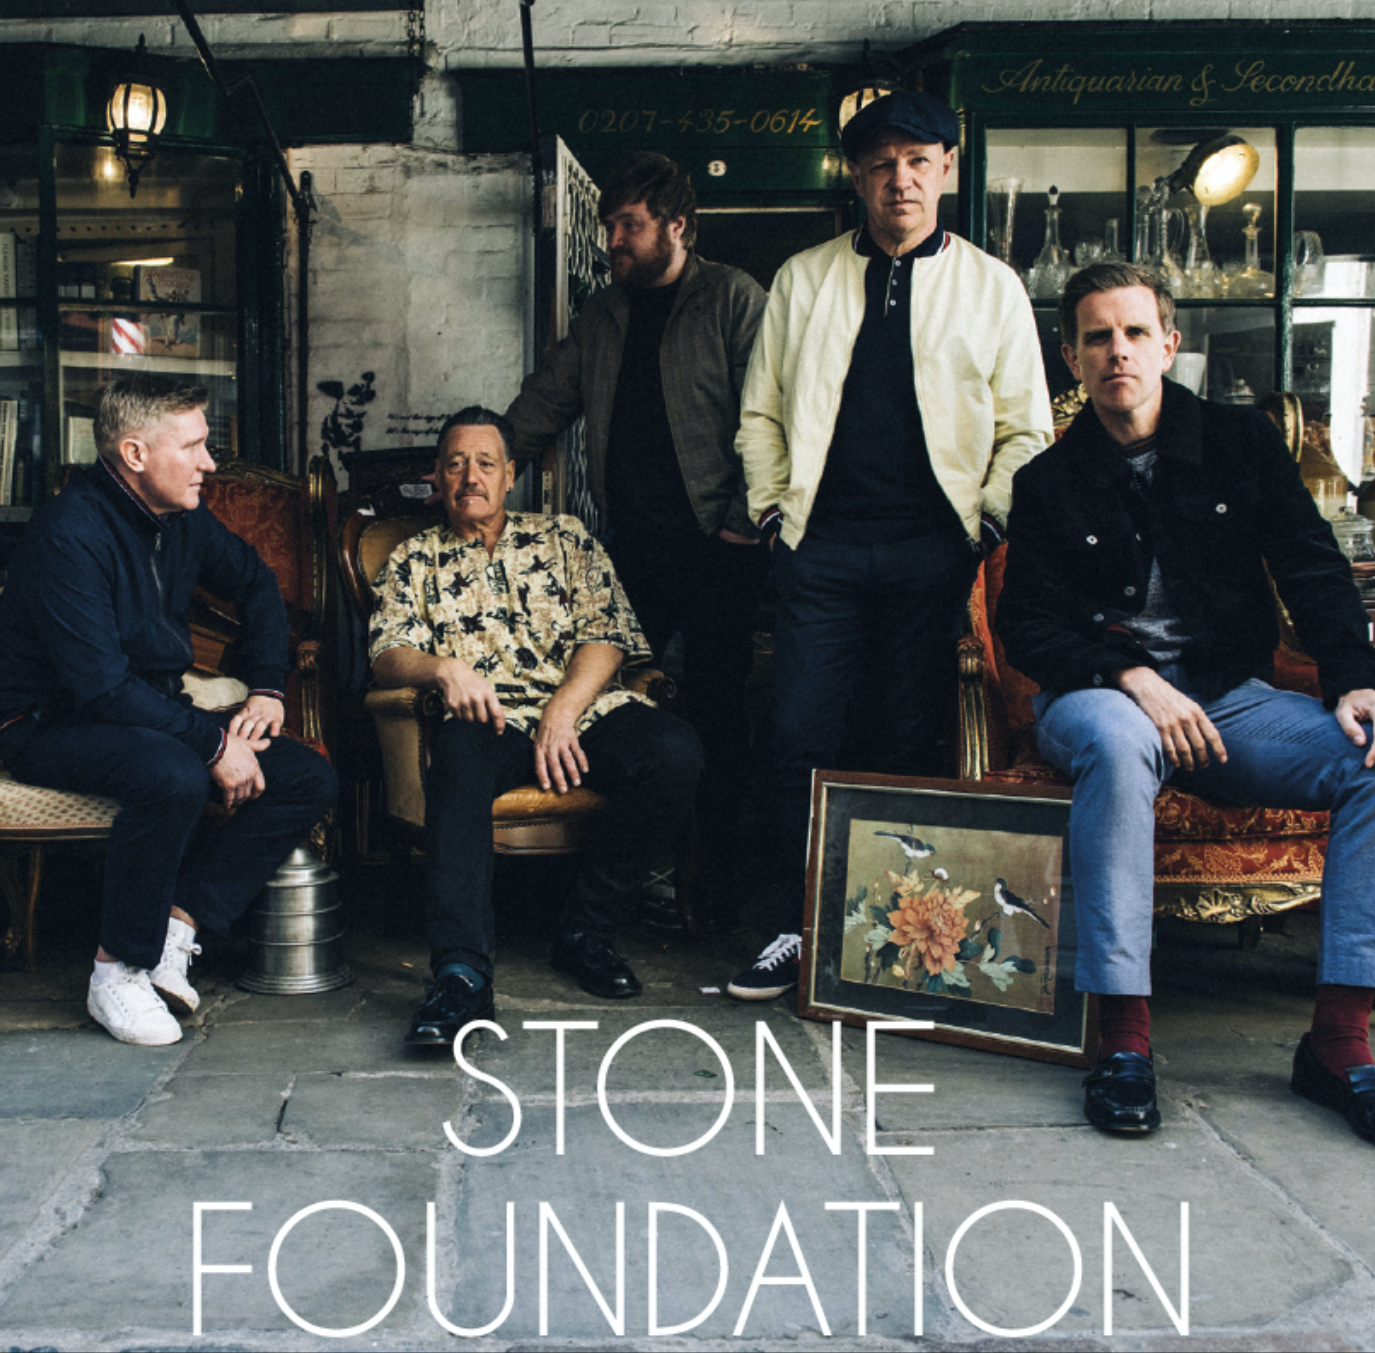 stone foundation pic